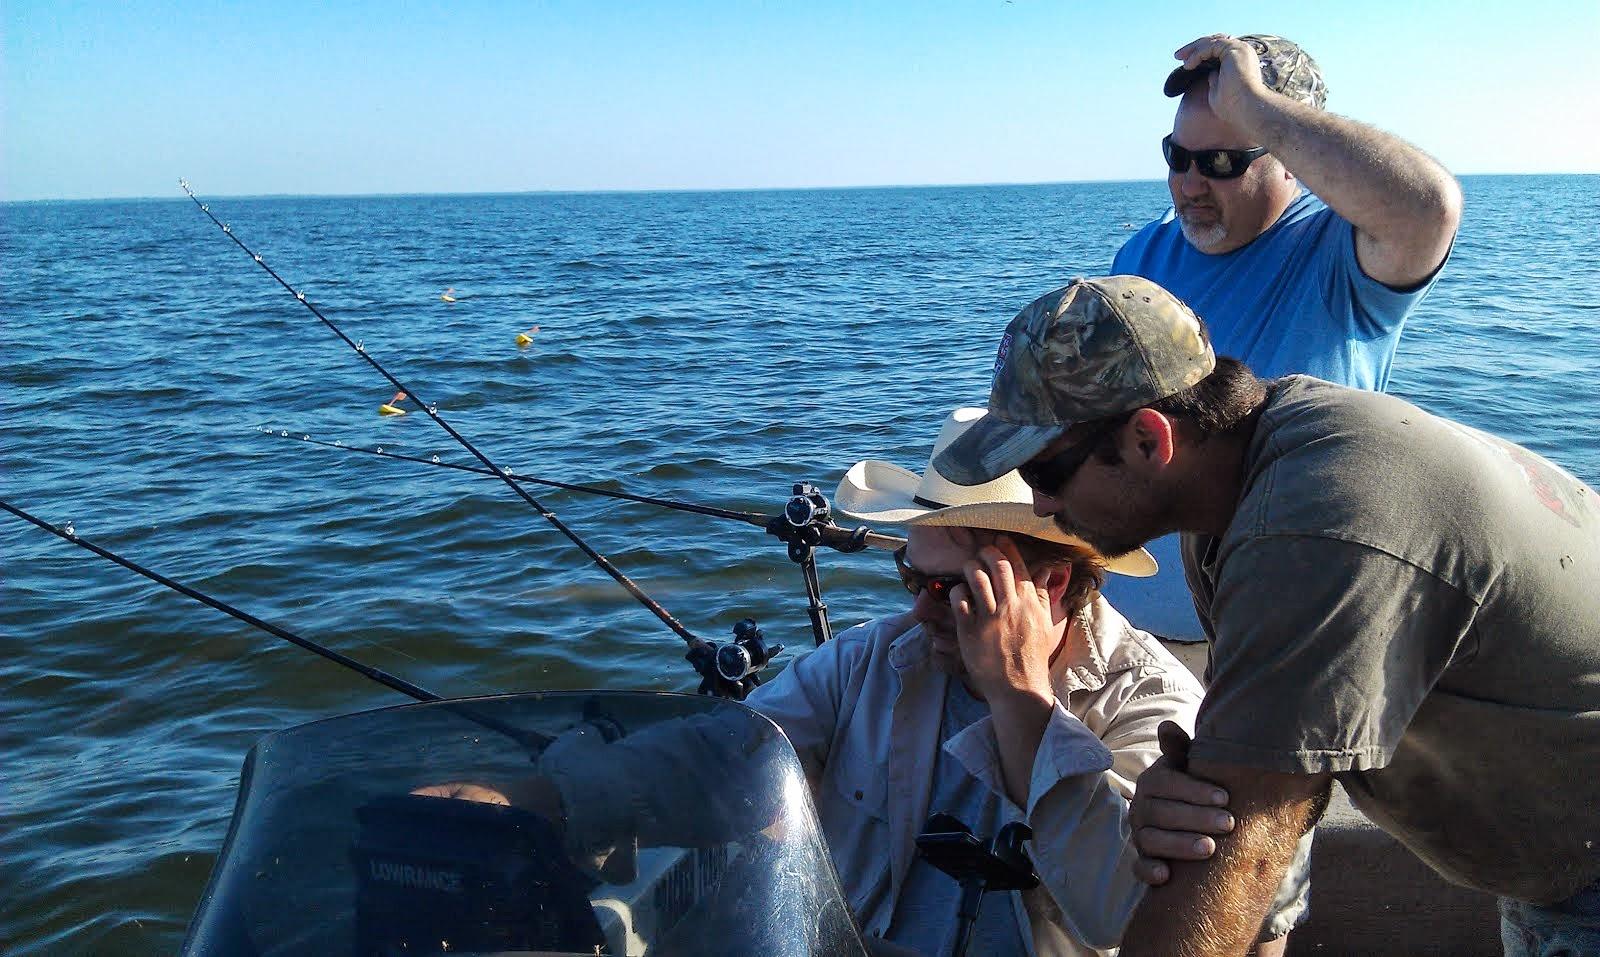 Houghton lake walleye report saginaw bay 7 14 13 for Saginaw bay fishing report